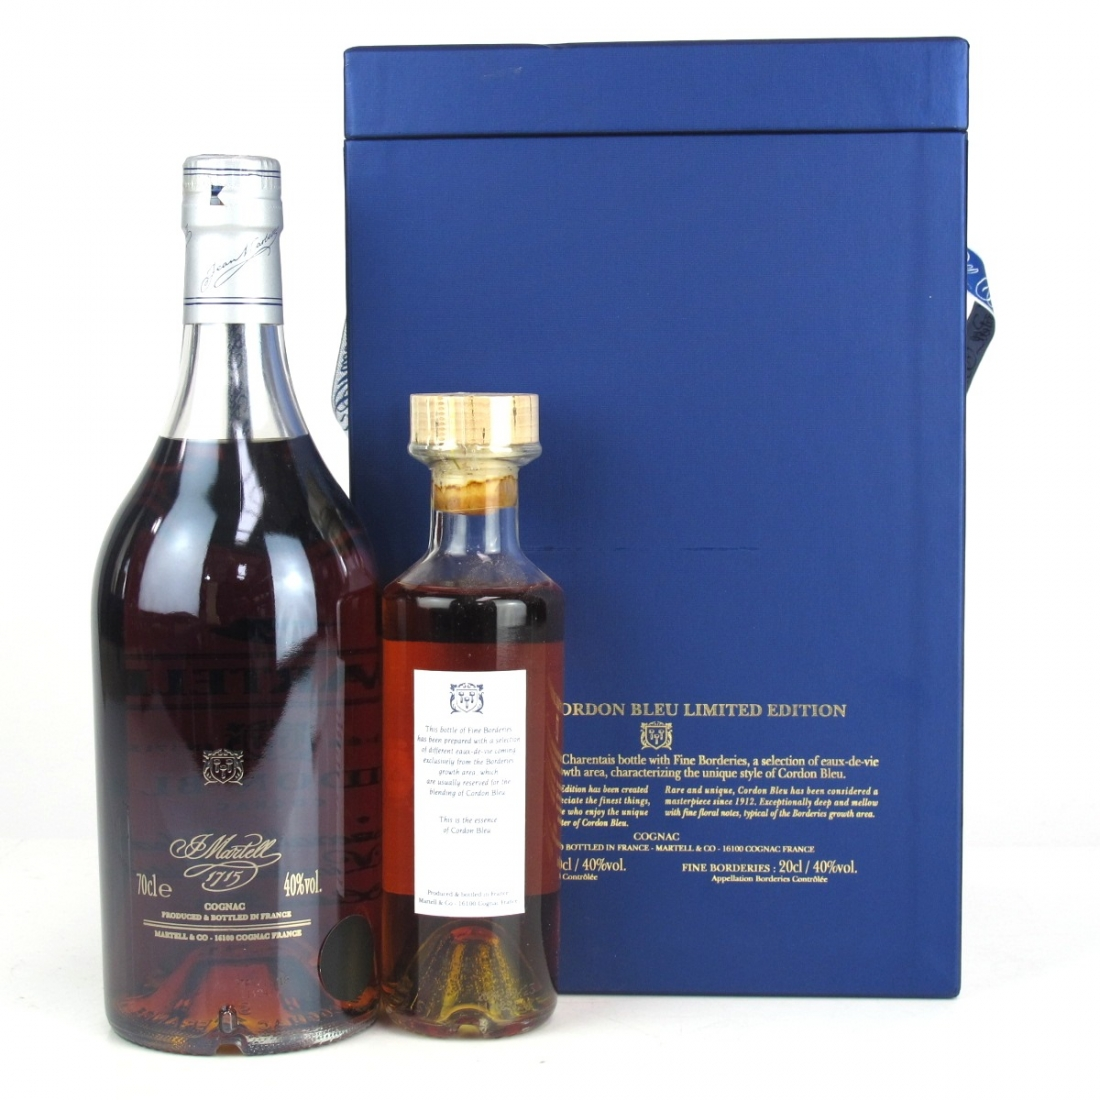 Martell Cordon Bleu Cognac Limited Edition / Including 20cl